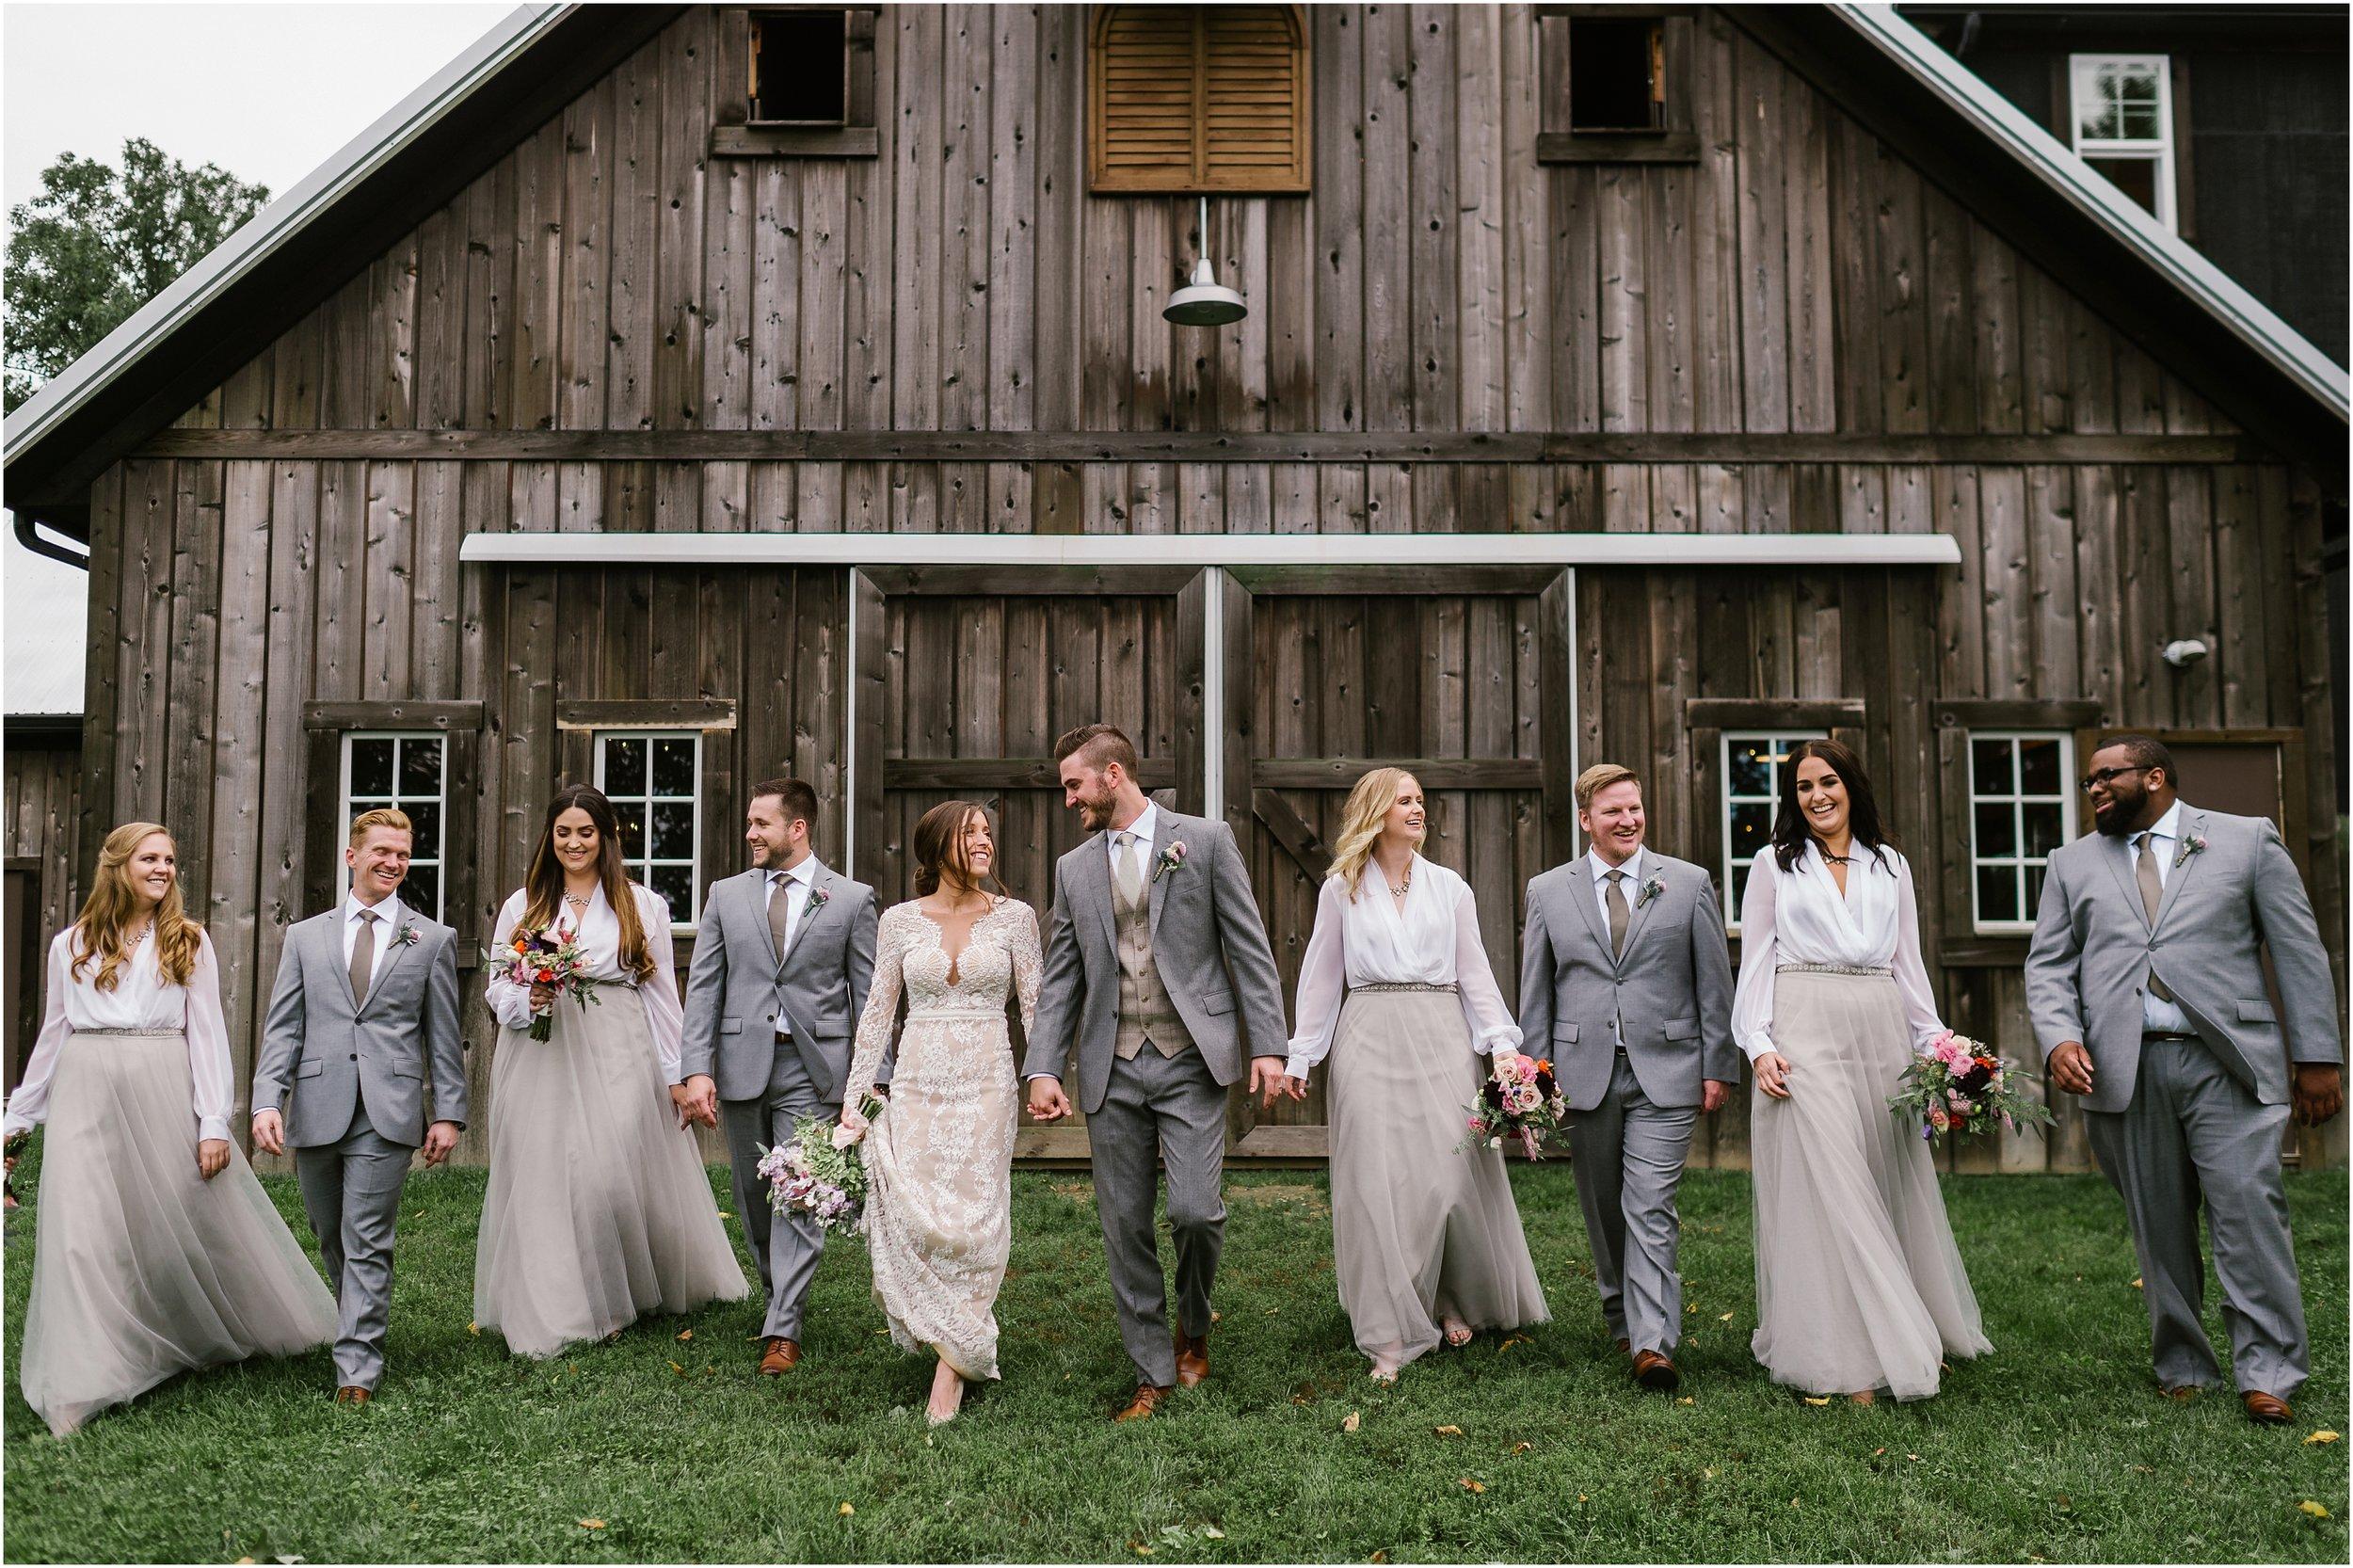 Rebecca_Shehorn_Photography_Indianapolis_Wedding_Photographer_9136.jpg